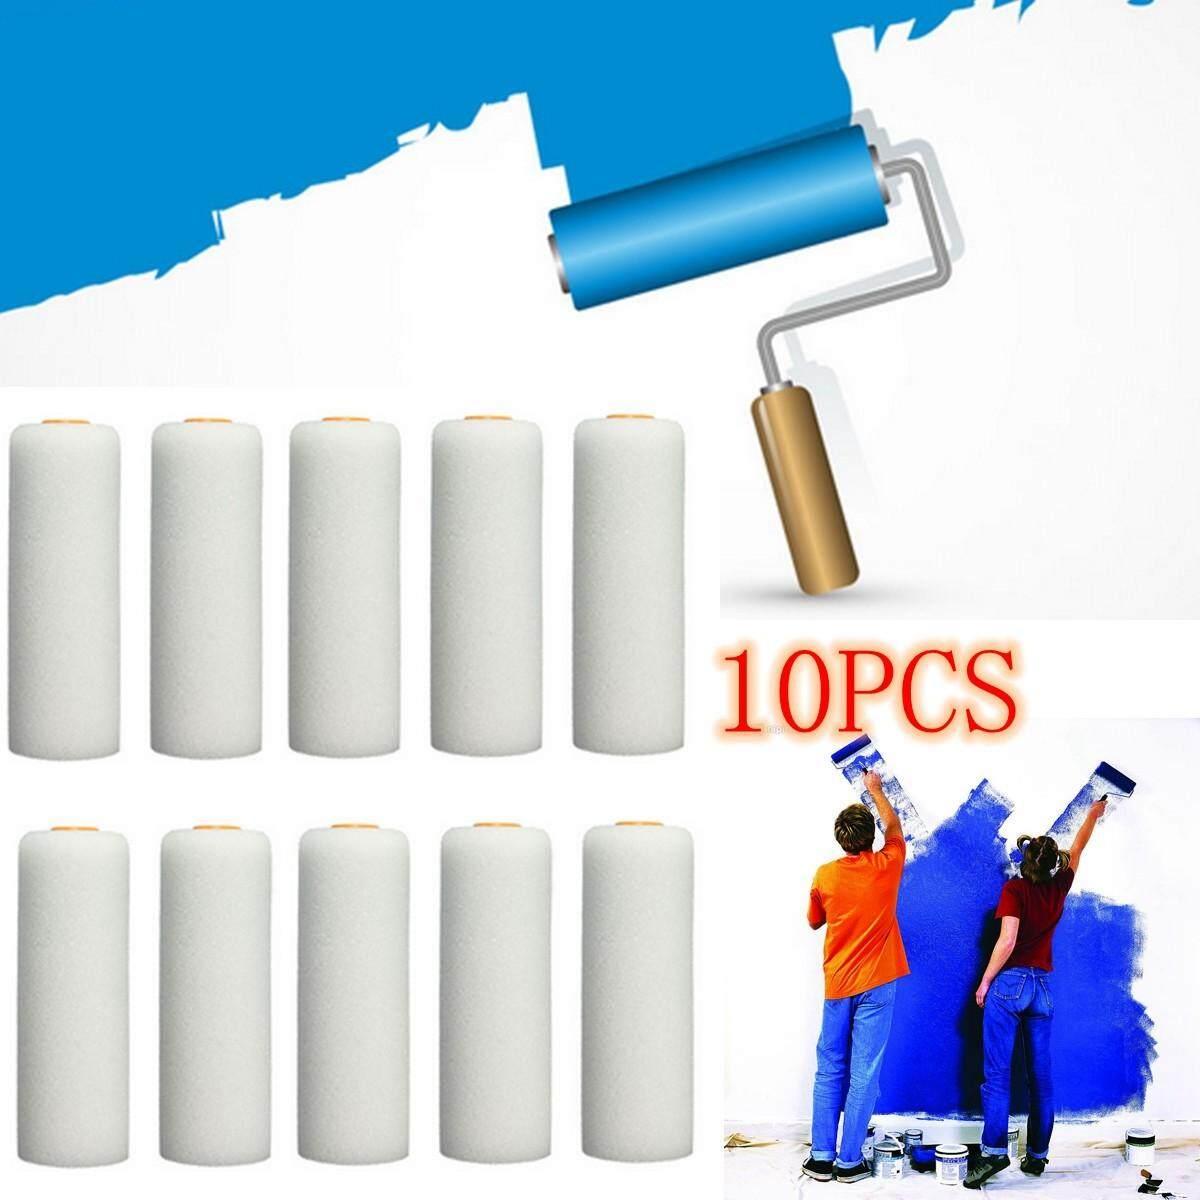 10 PCS 100mm Paint Foam Sponge Rollers Decorators Brush Evenly & Smooth Home NEW